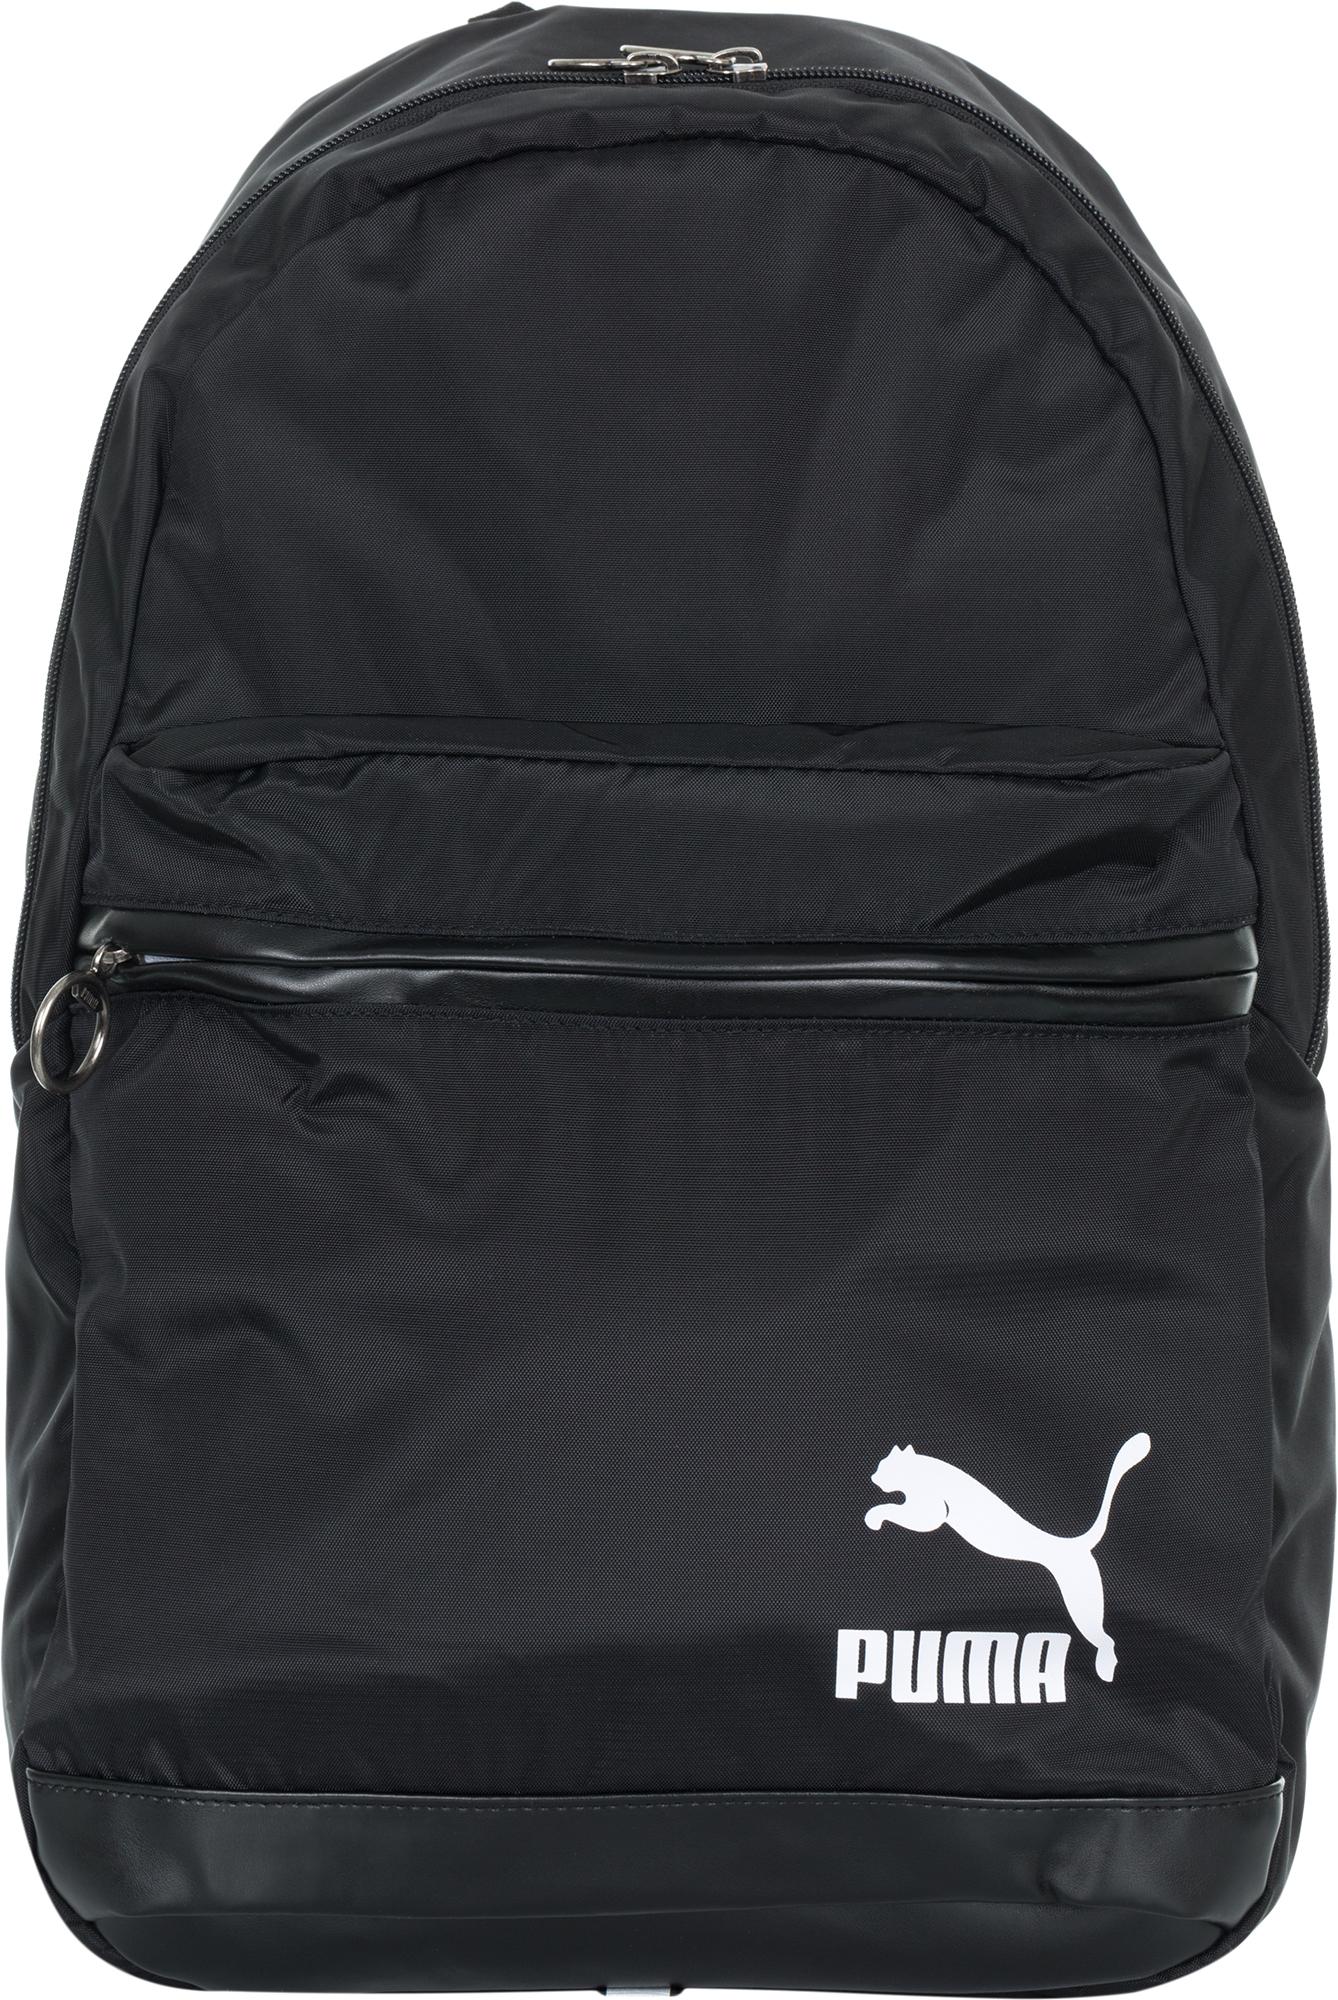 Puma Рюкзак Puma Originals adidas originals ad093eguni58